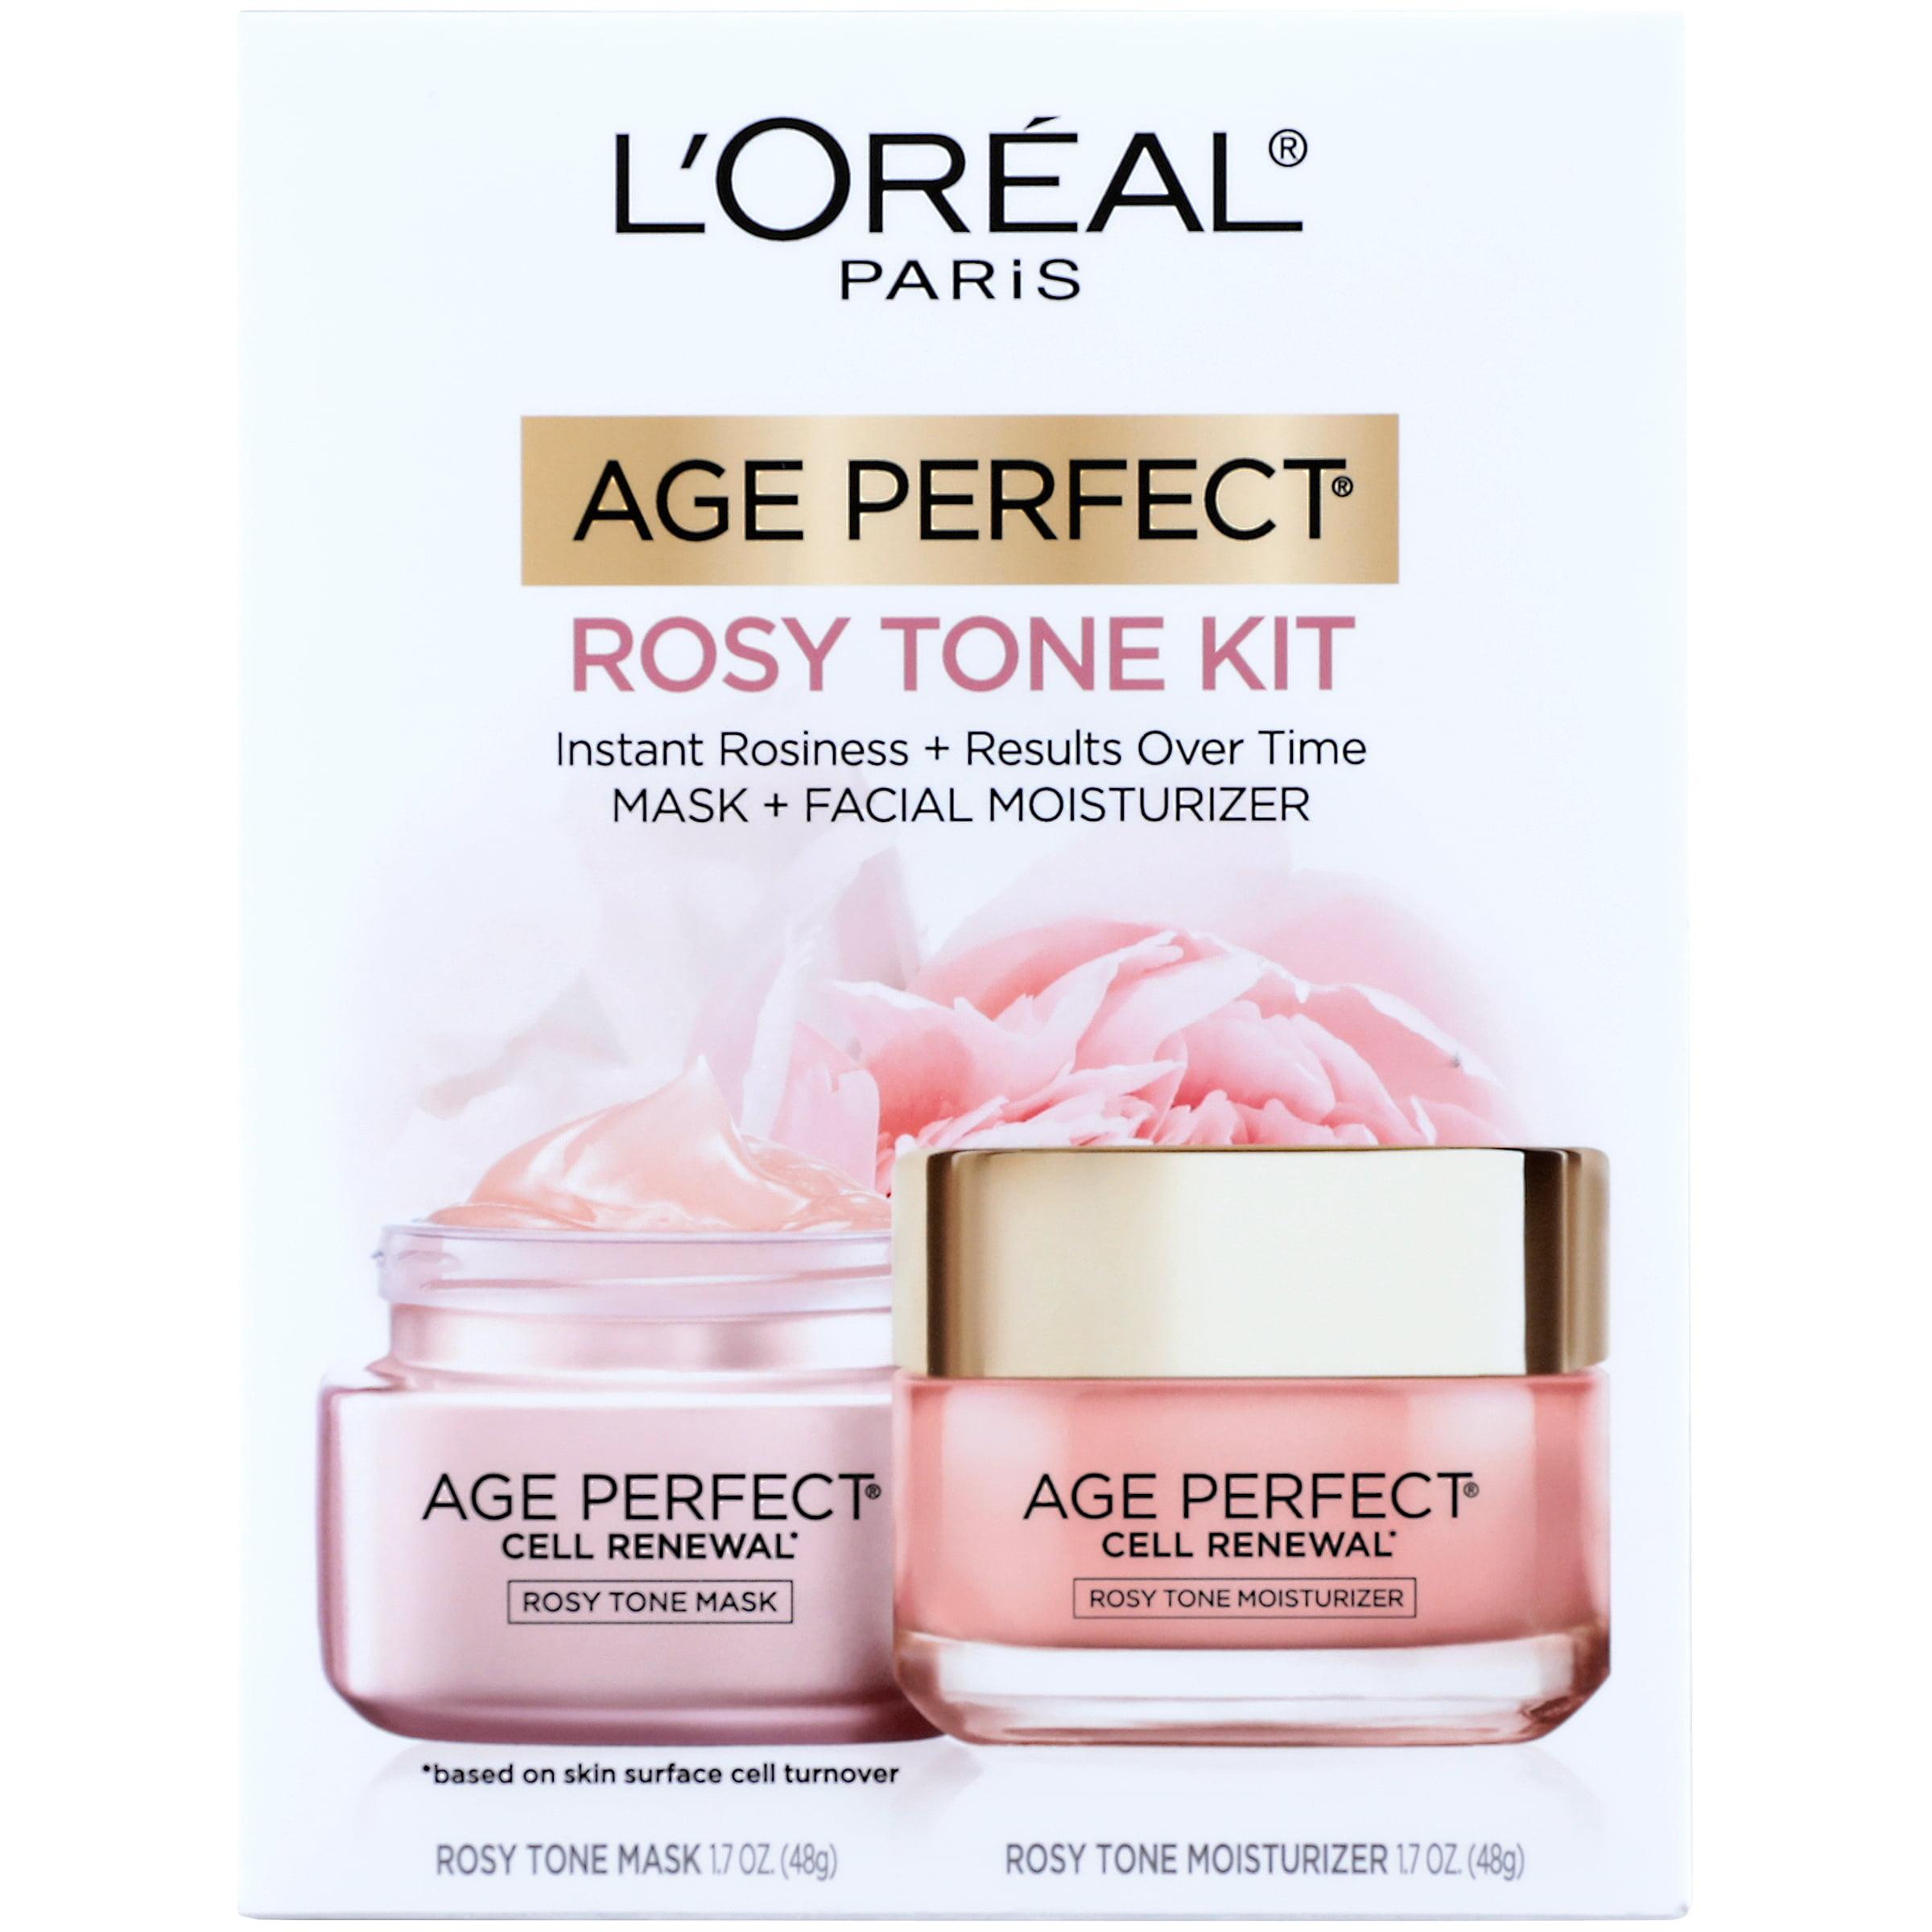 L'Oreal Paris Age Perfect Cell Renewal Rosy Tone Kit